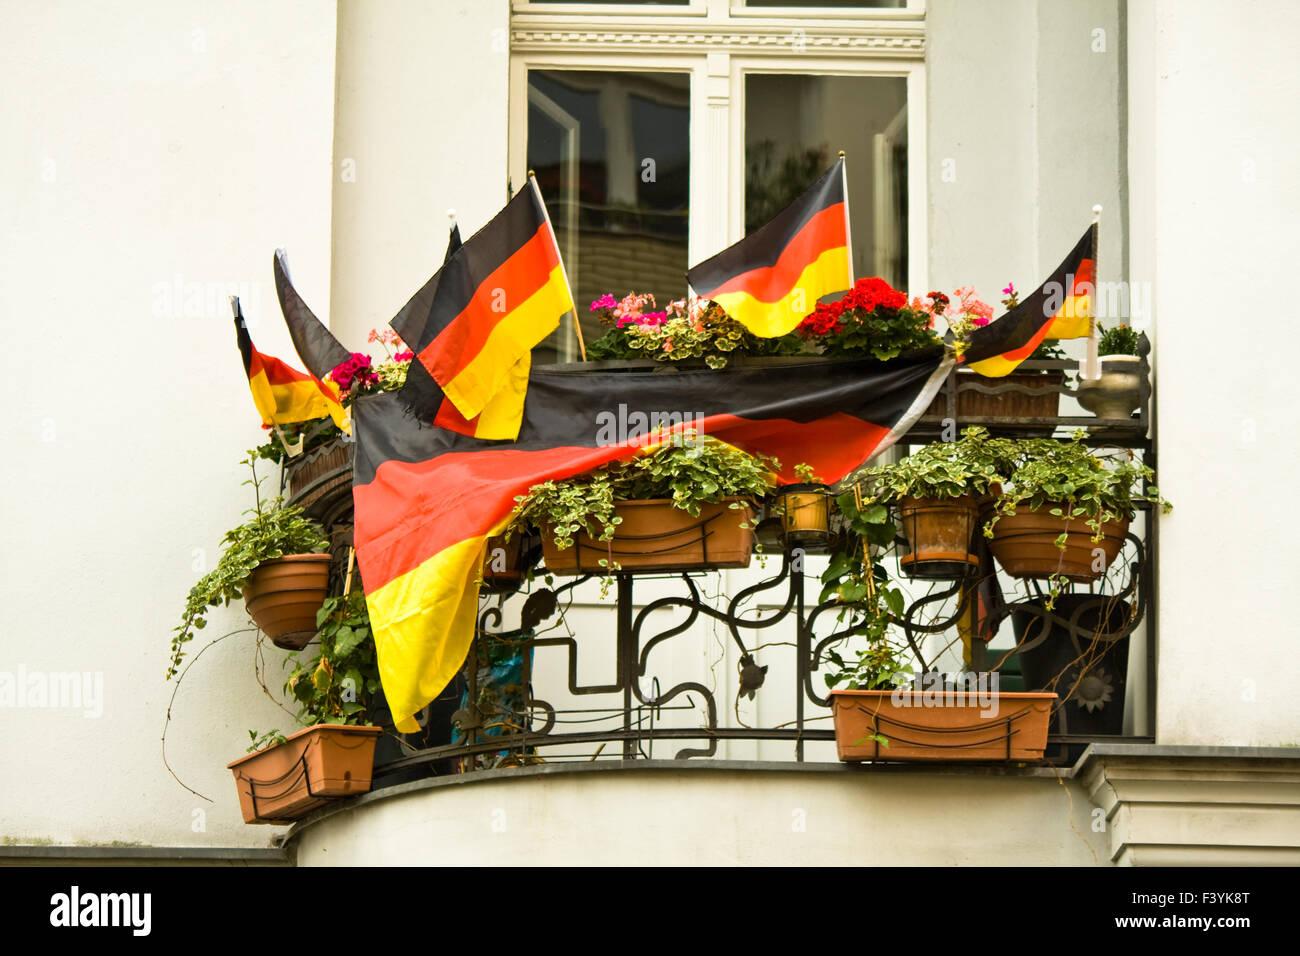 germany, flag - Stock Image